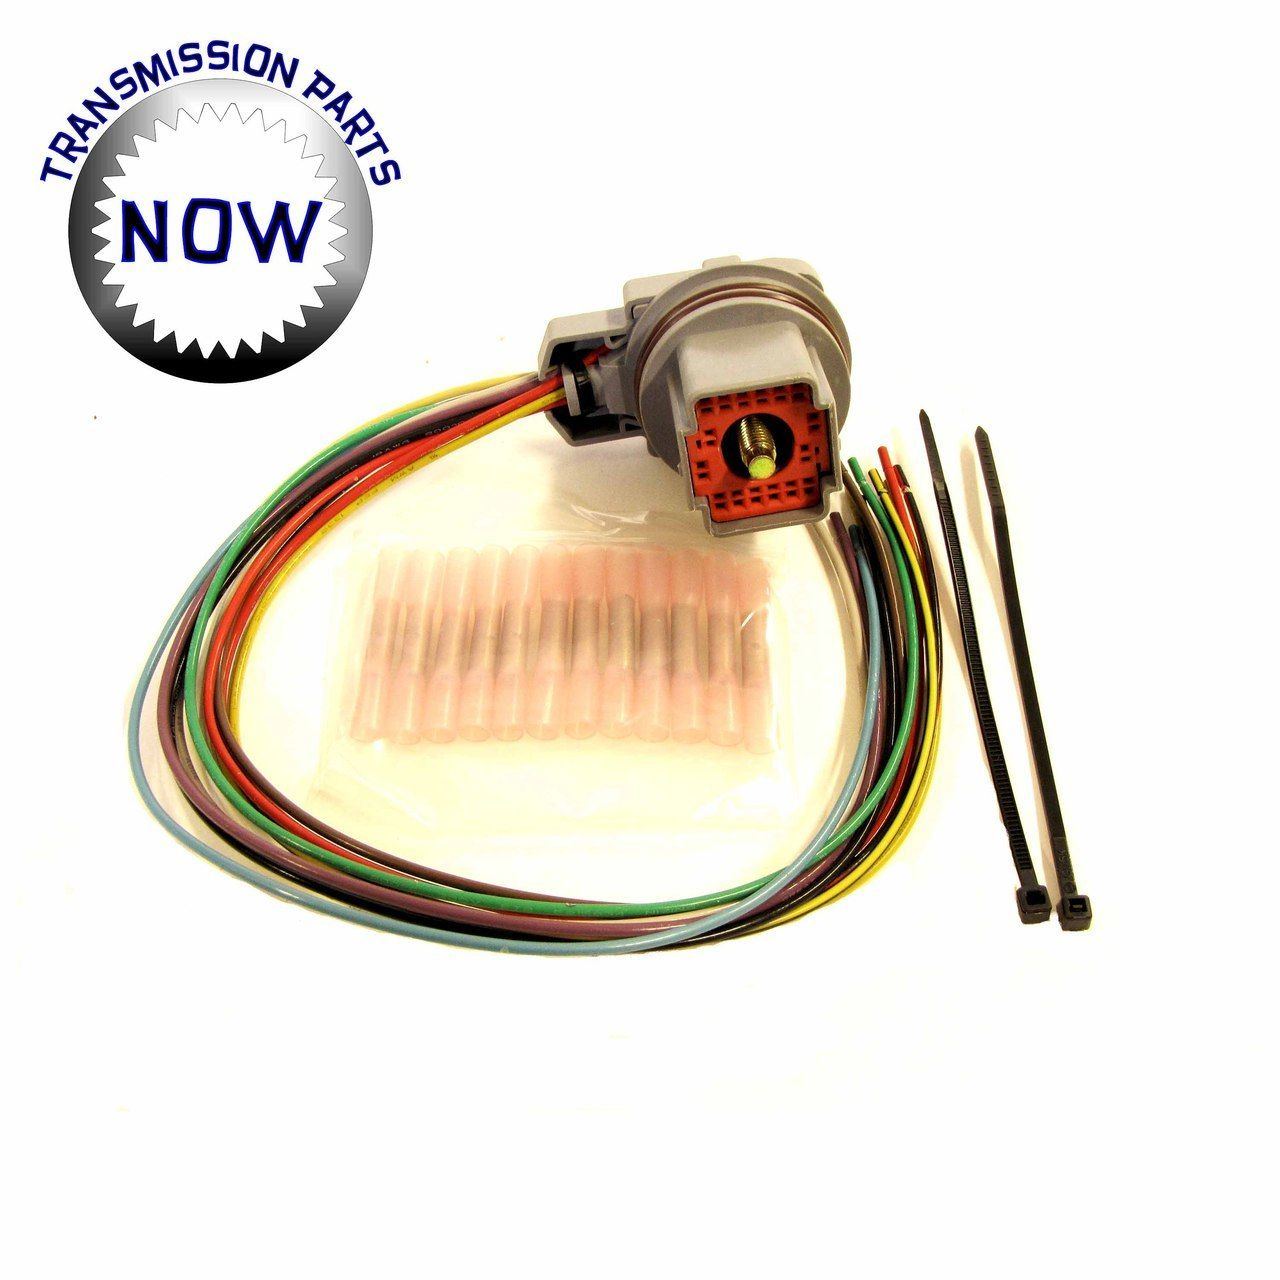 5r55w 5r55s solenoid connector repair kit  [ 1280 x 1280 Pixel ]